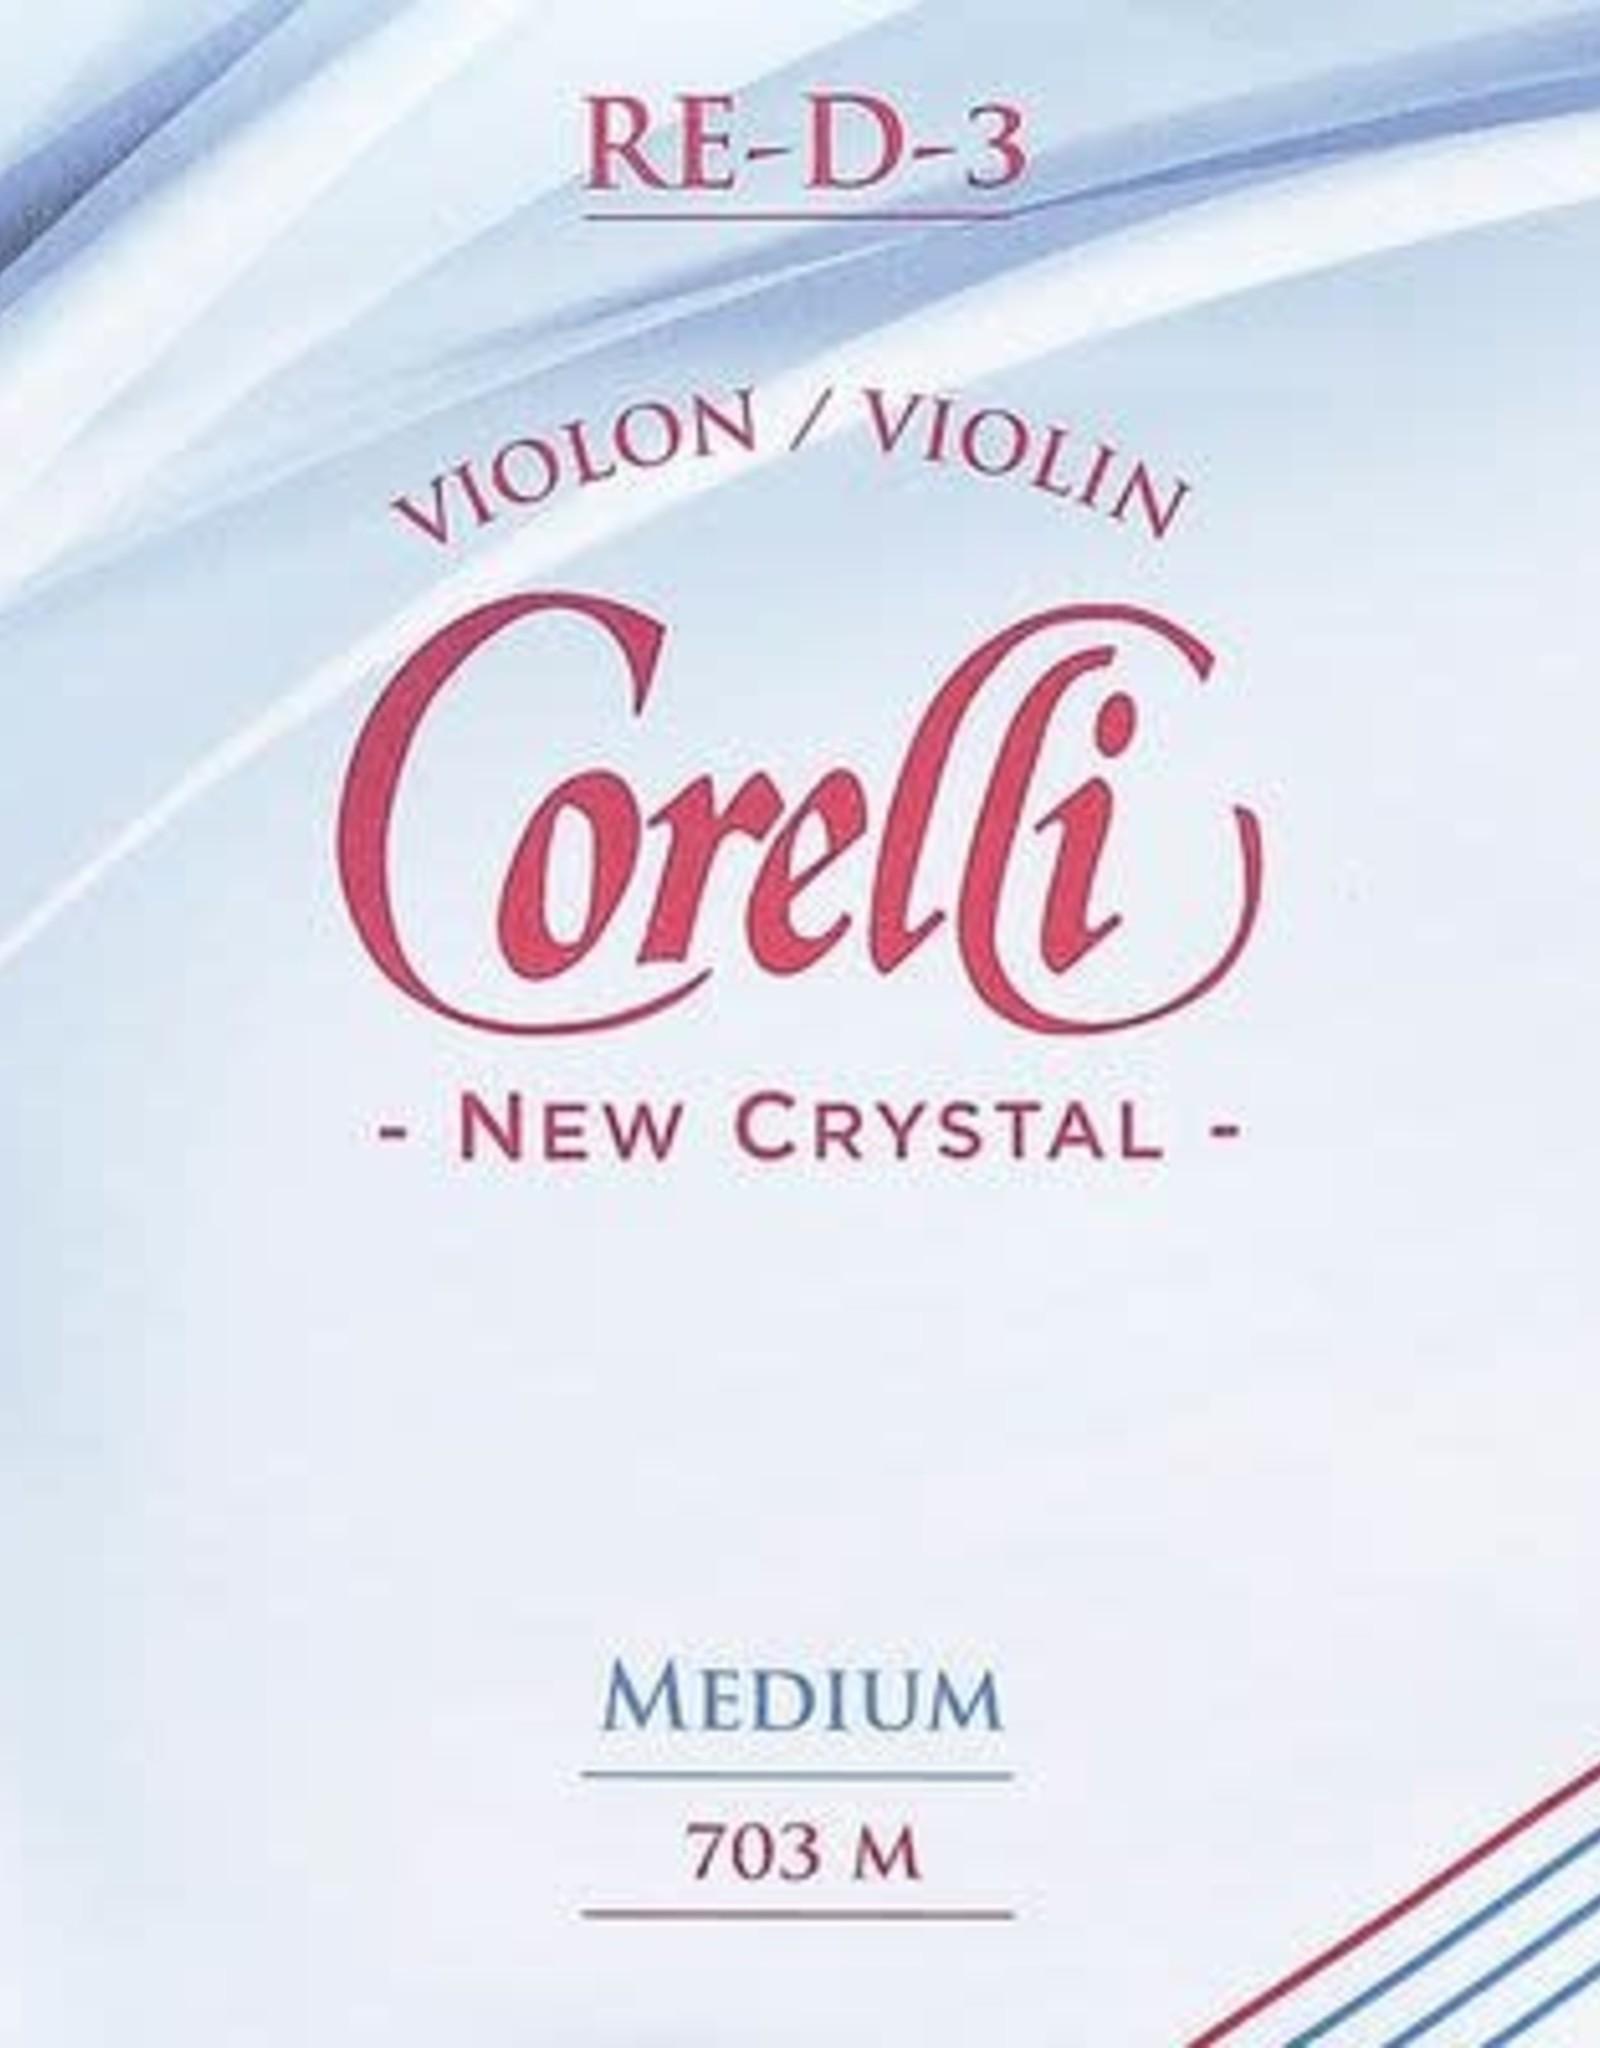 CORELLI new crystal, vioolsnaar, re (d-3), 4/4